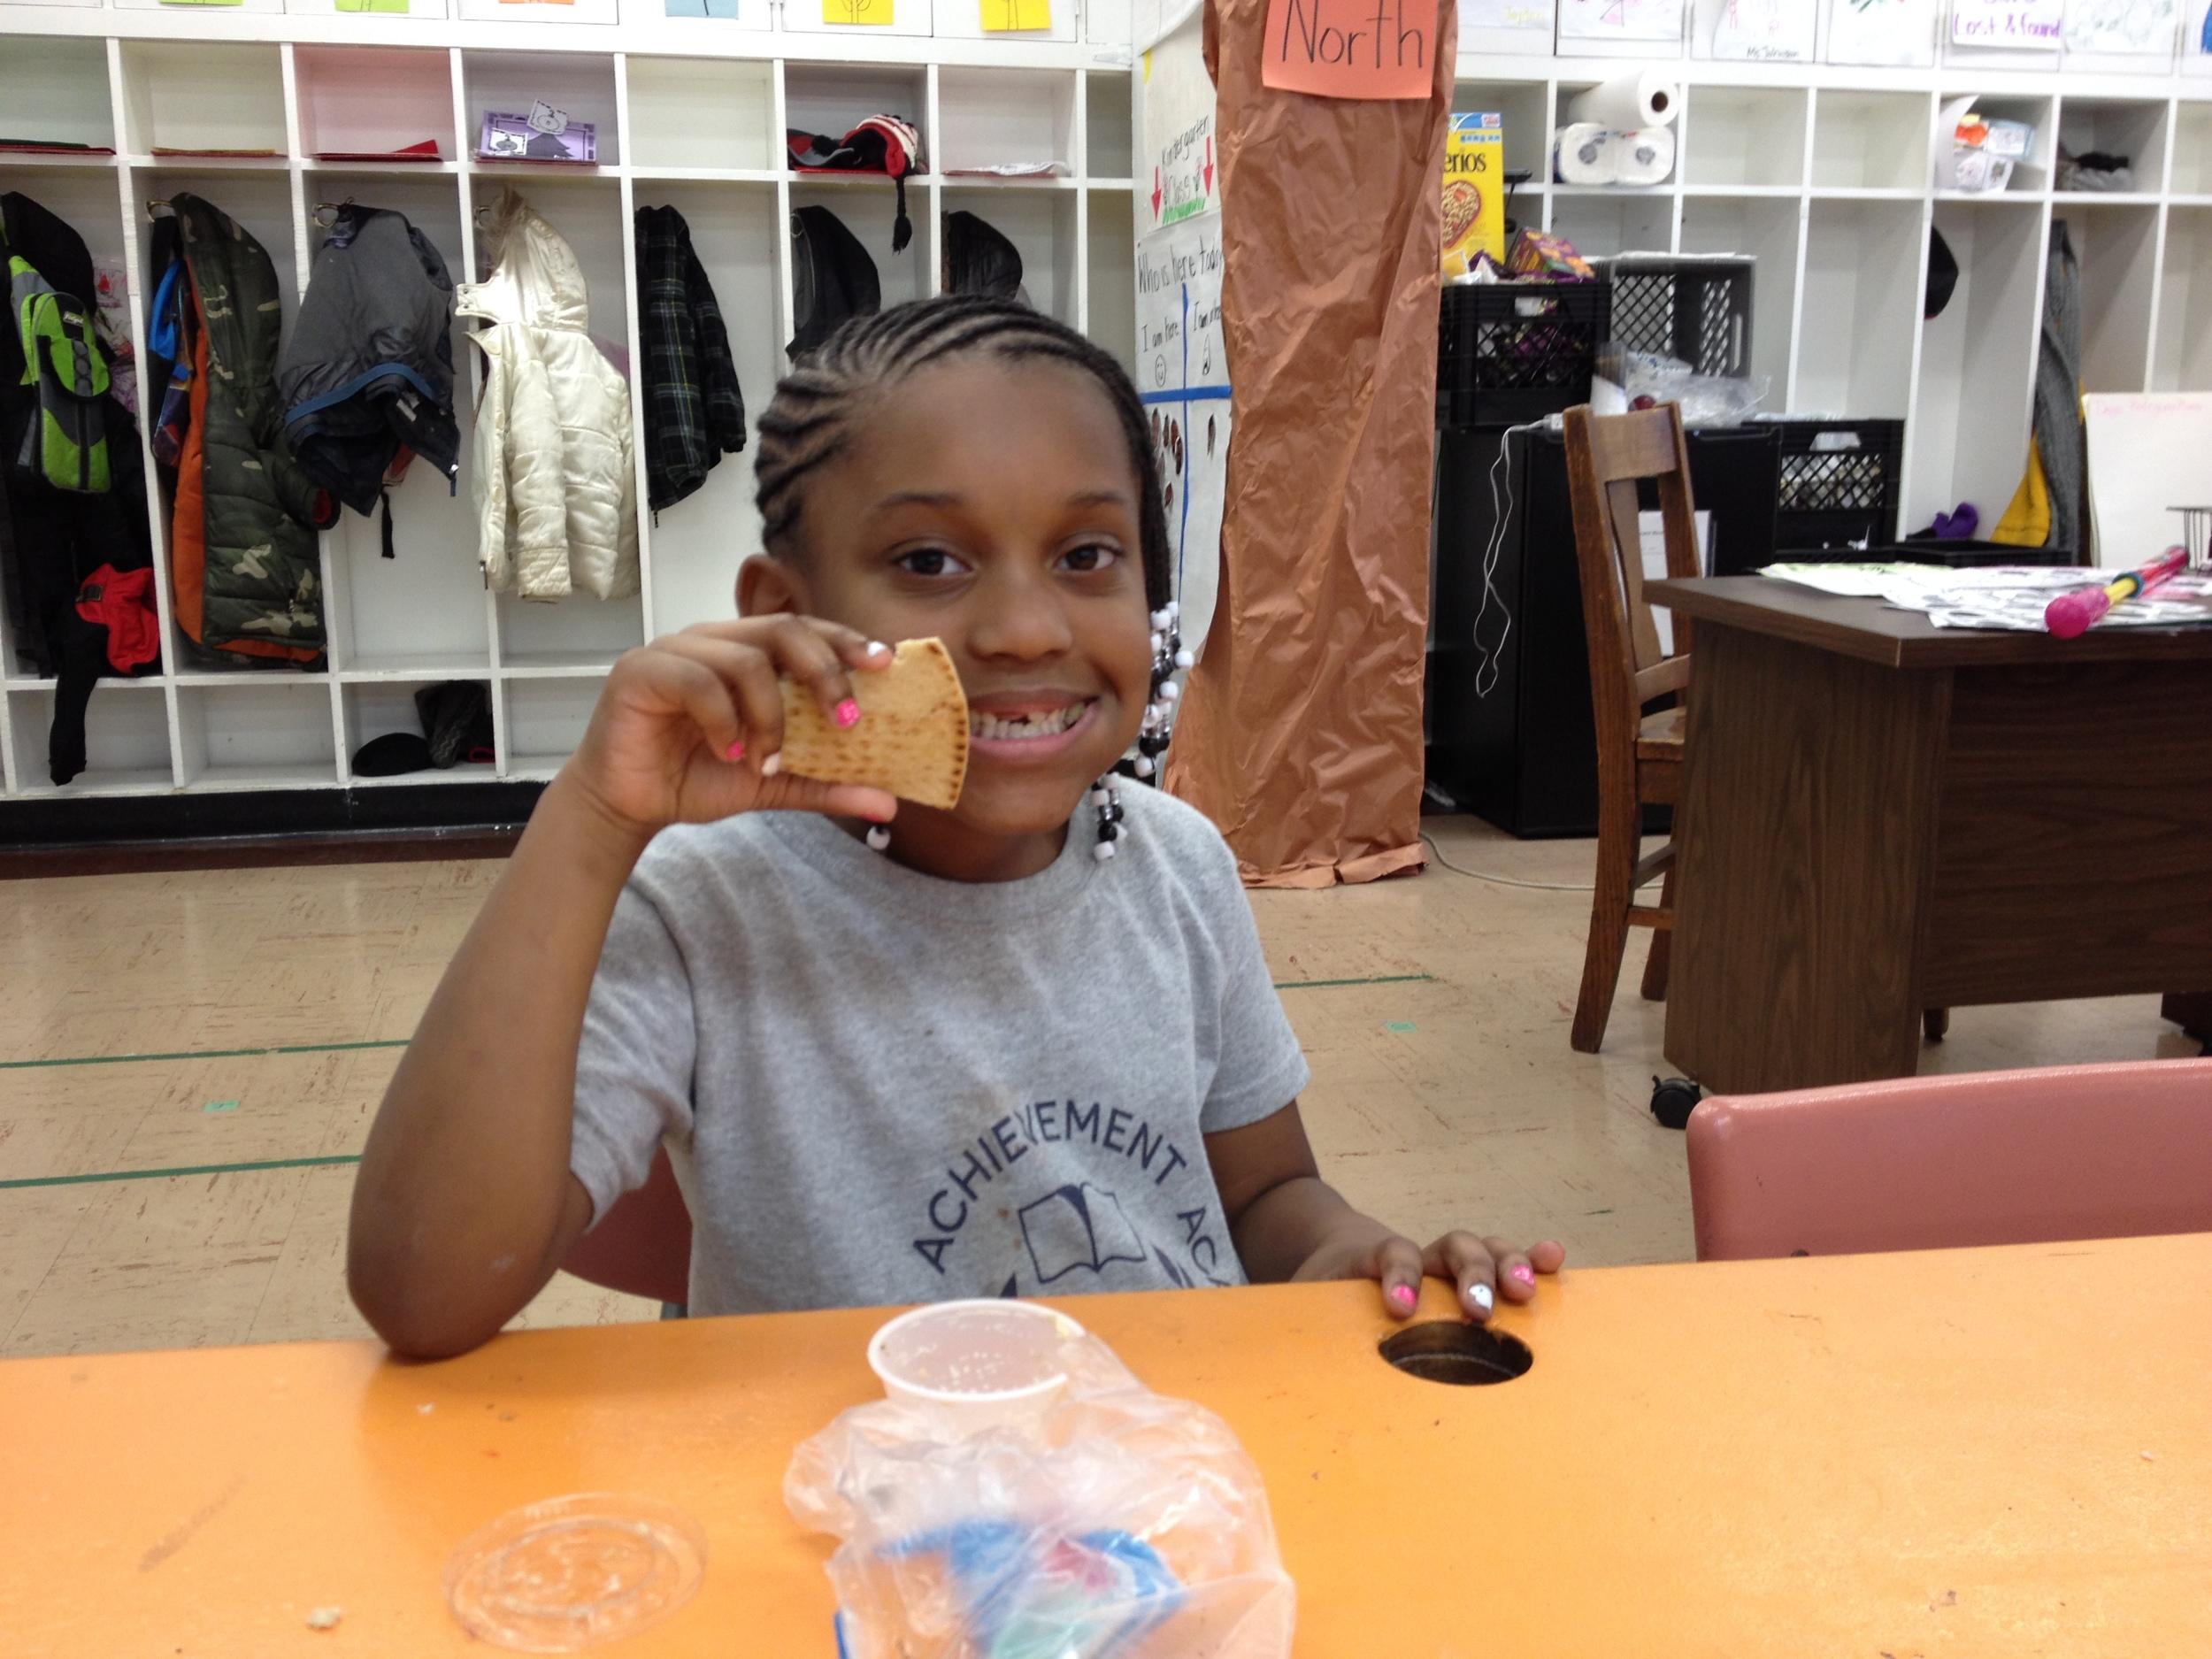 Janiya has pita & hummus for snack.